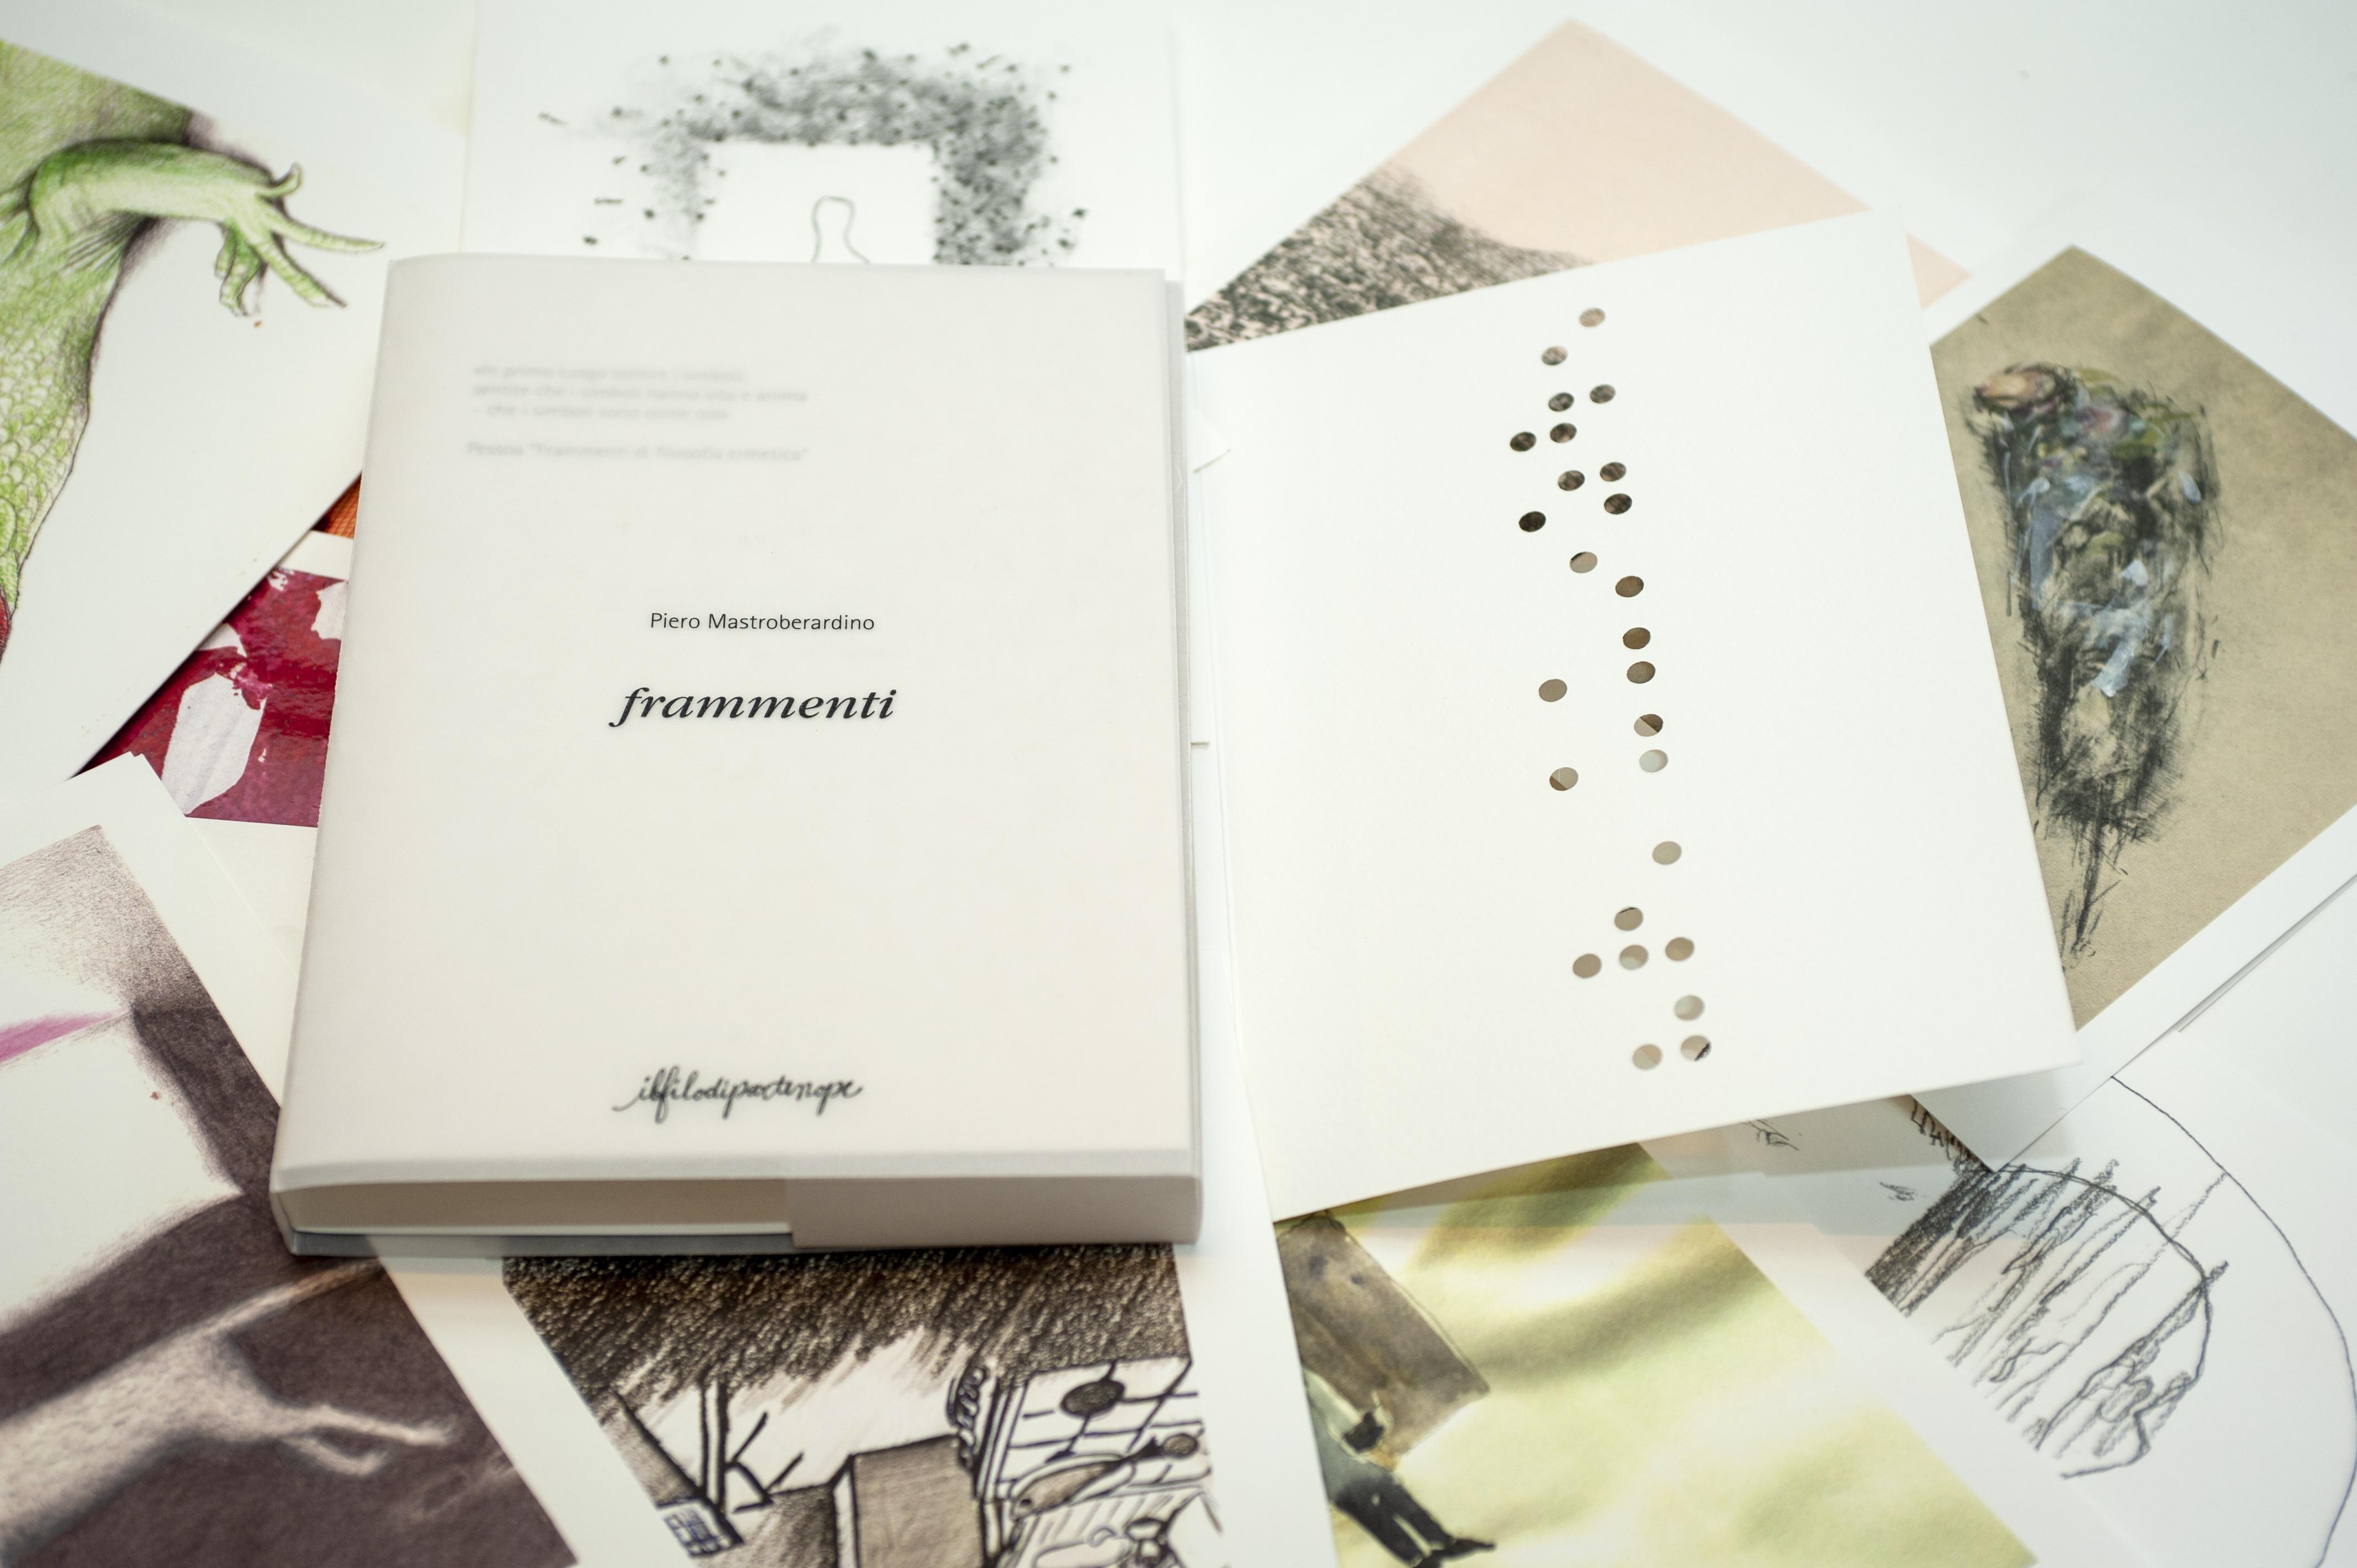 Frammenti - Piero Mastroberadino